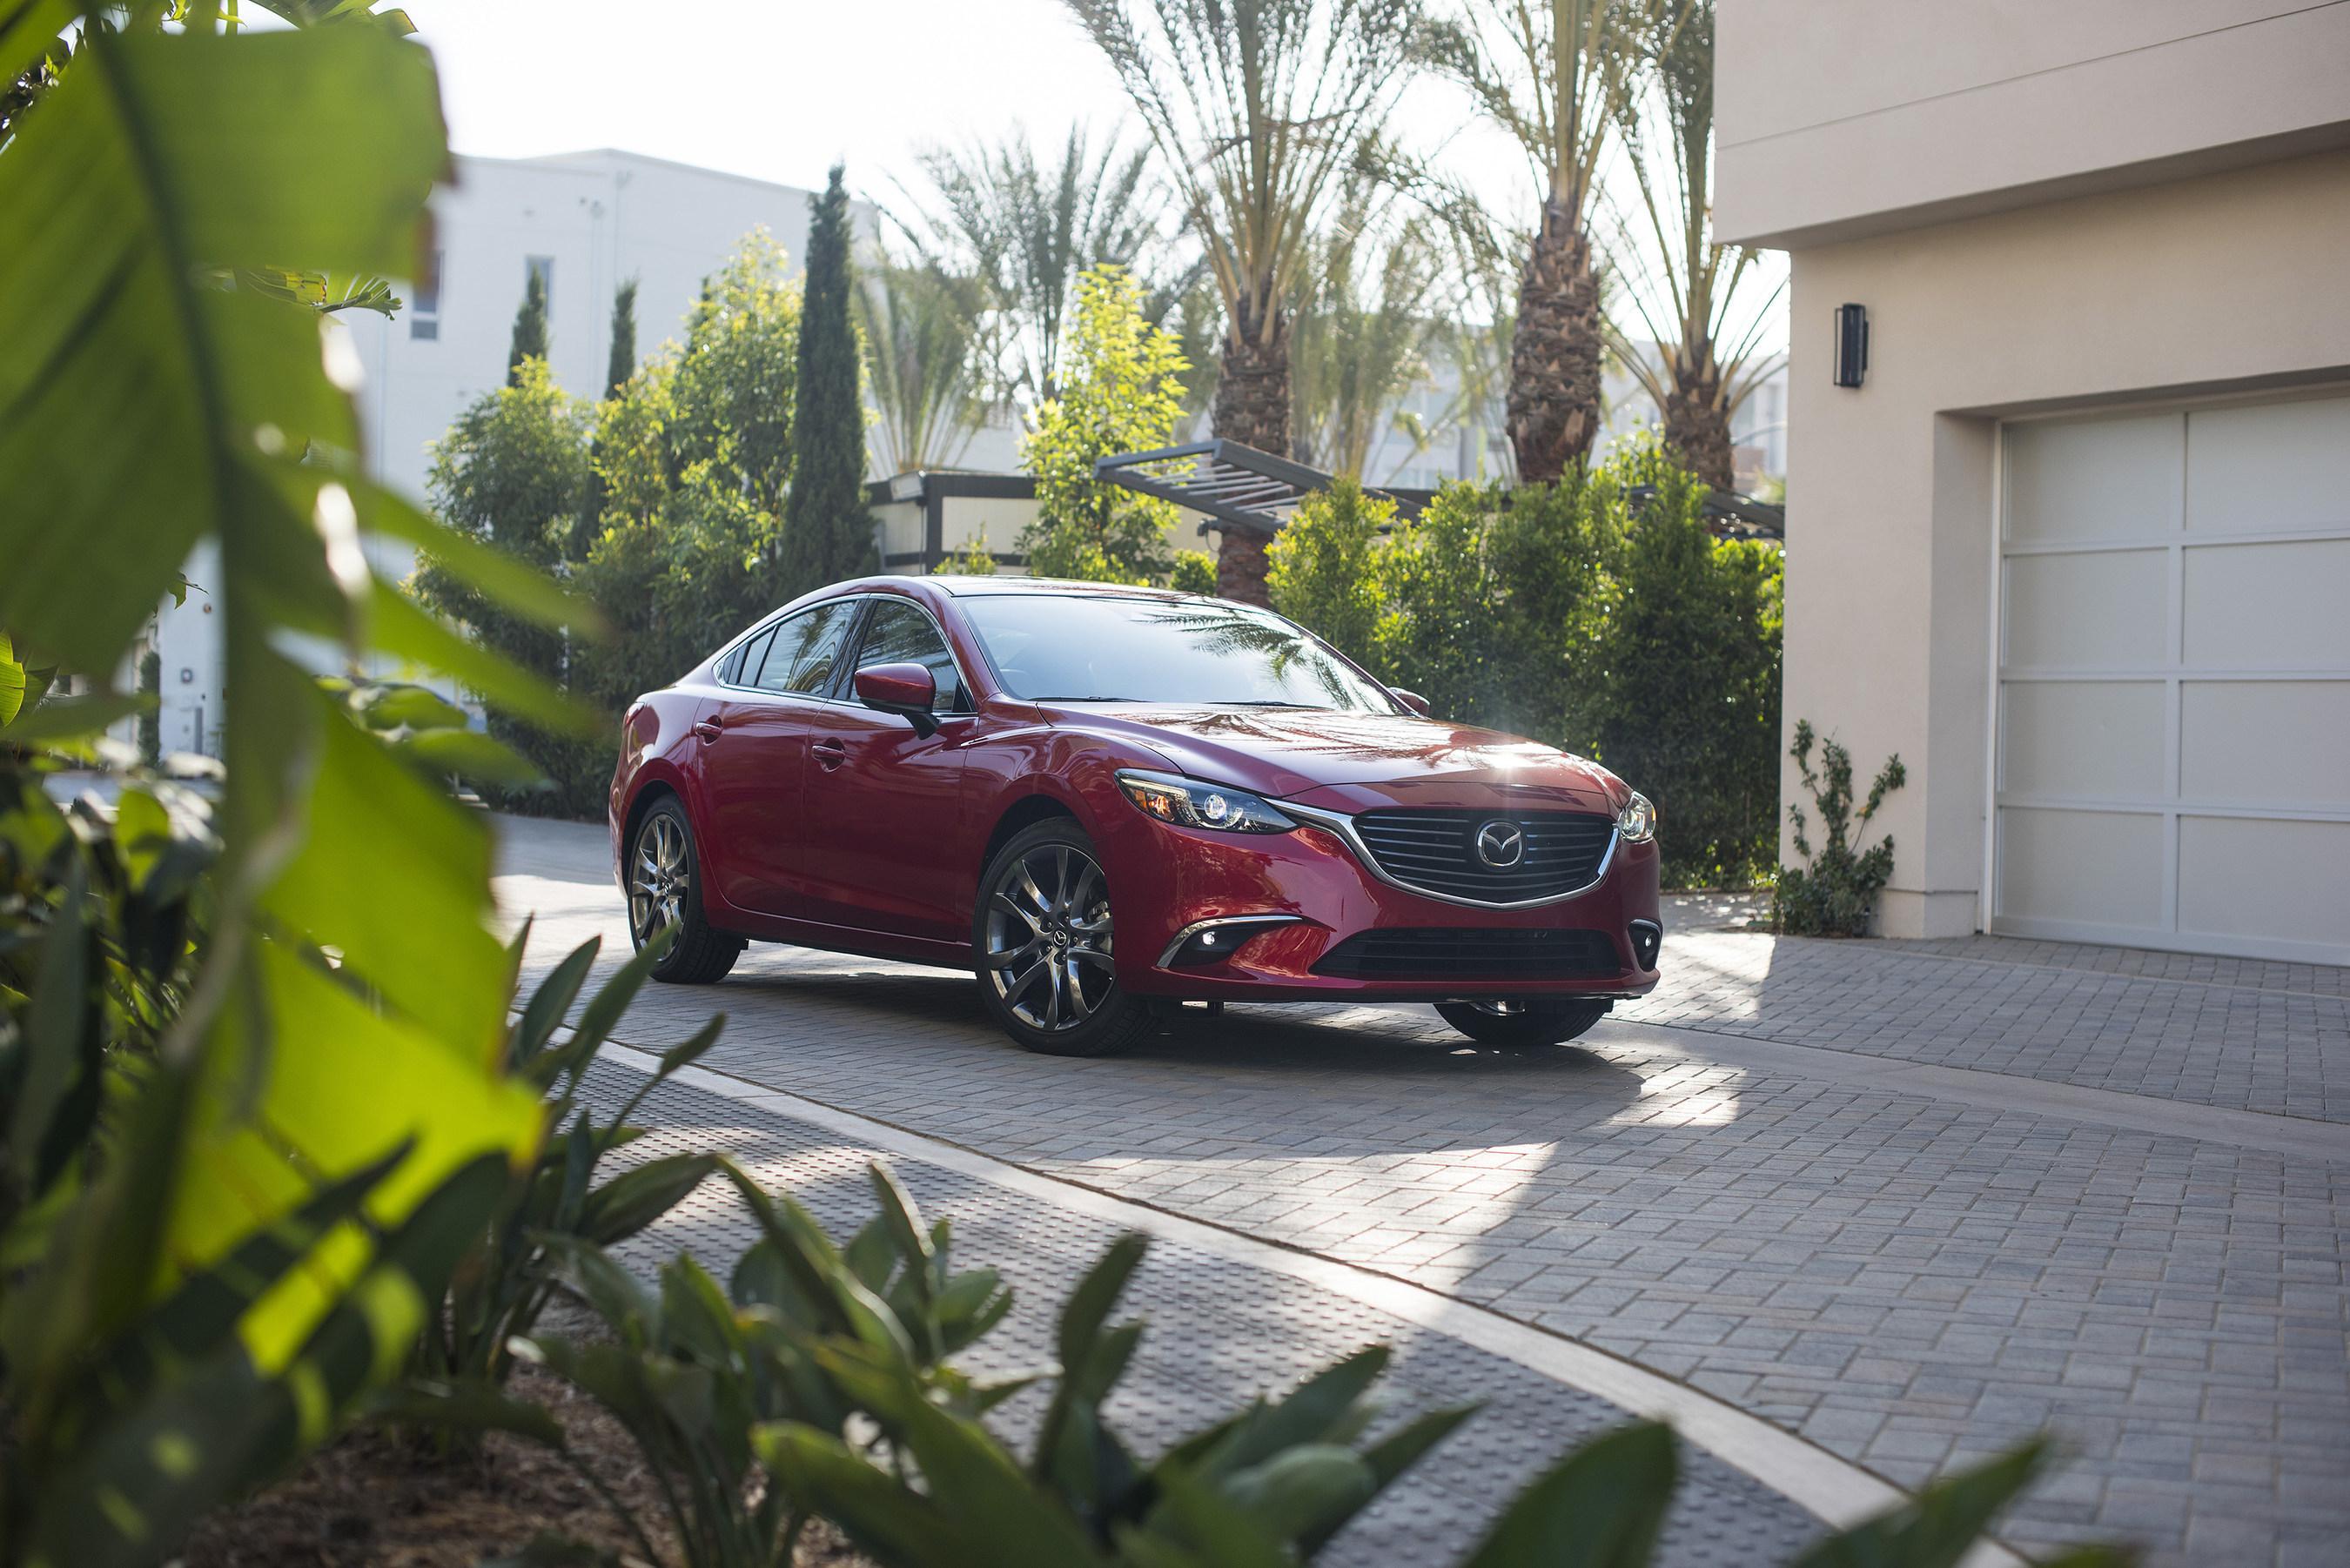 Mazda CX-3, Mazda3 and Mazda6 Earn 2017 IIHS Top Safety Pick+ Honors